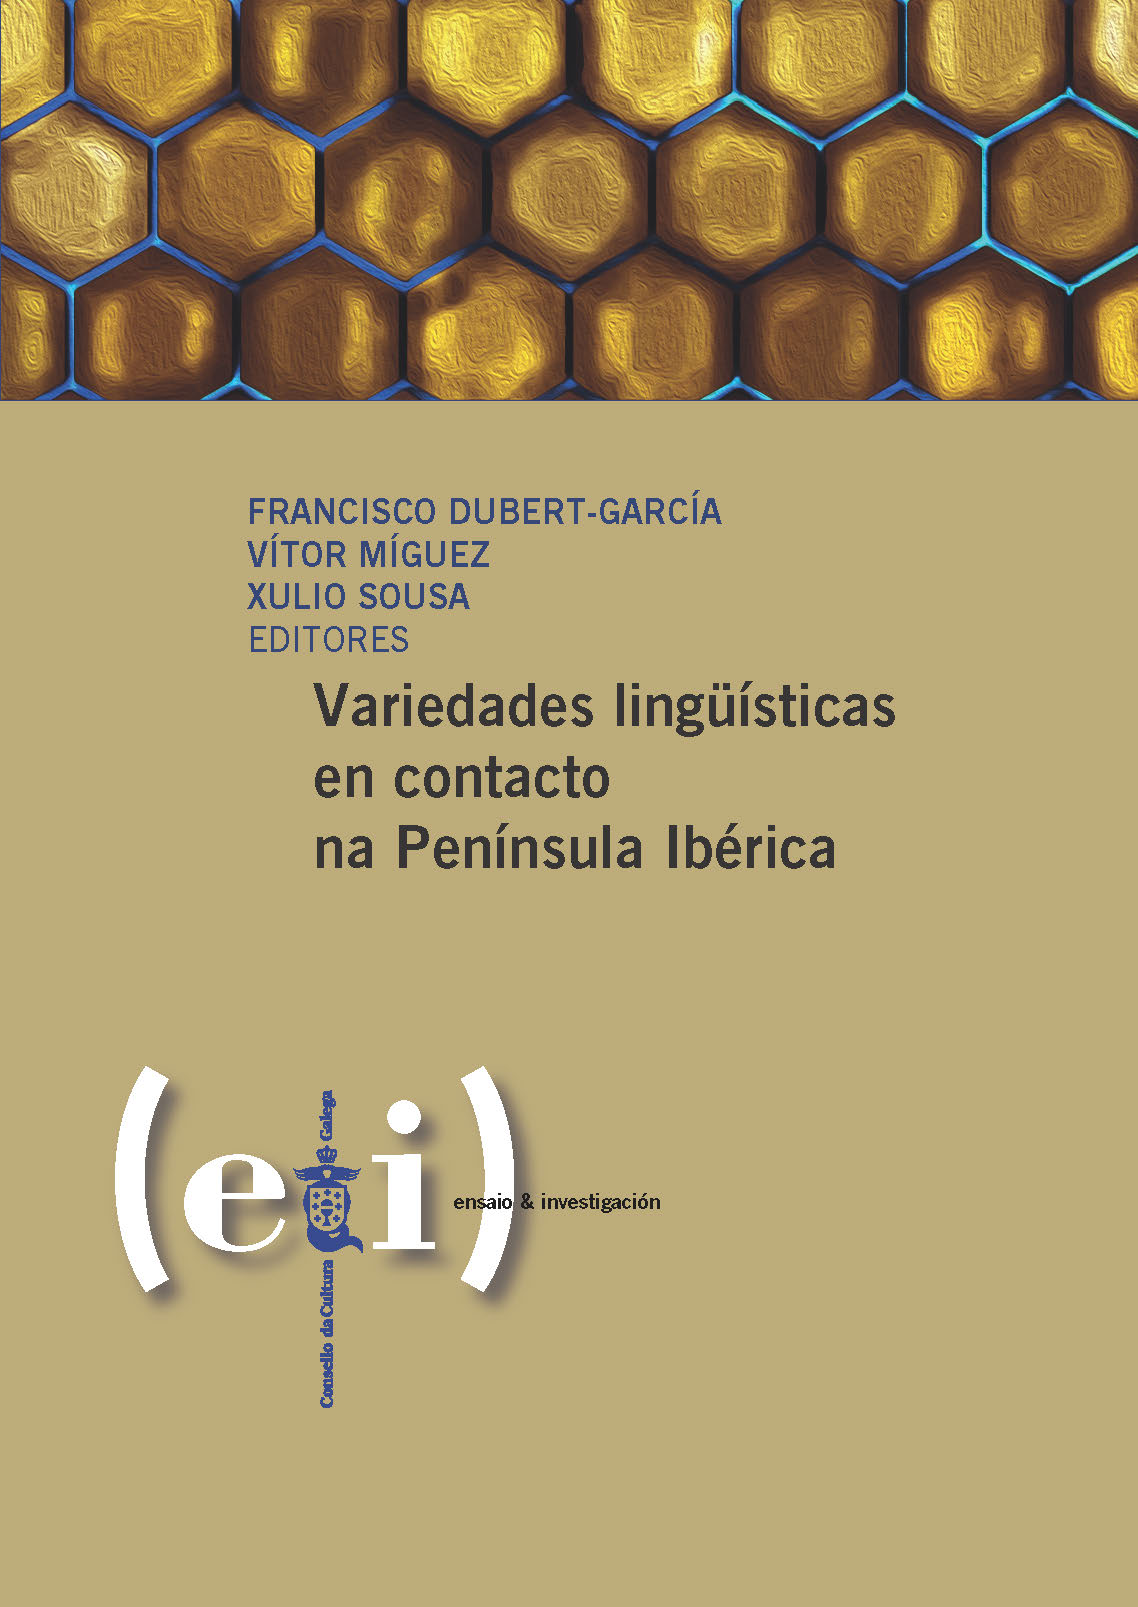 Portada de  Variedades lingüísticas en contacto na Península Ibérica